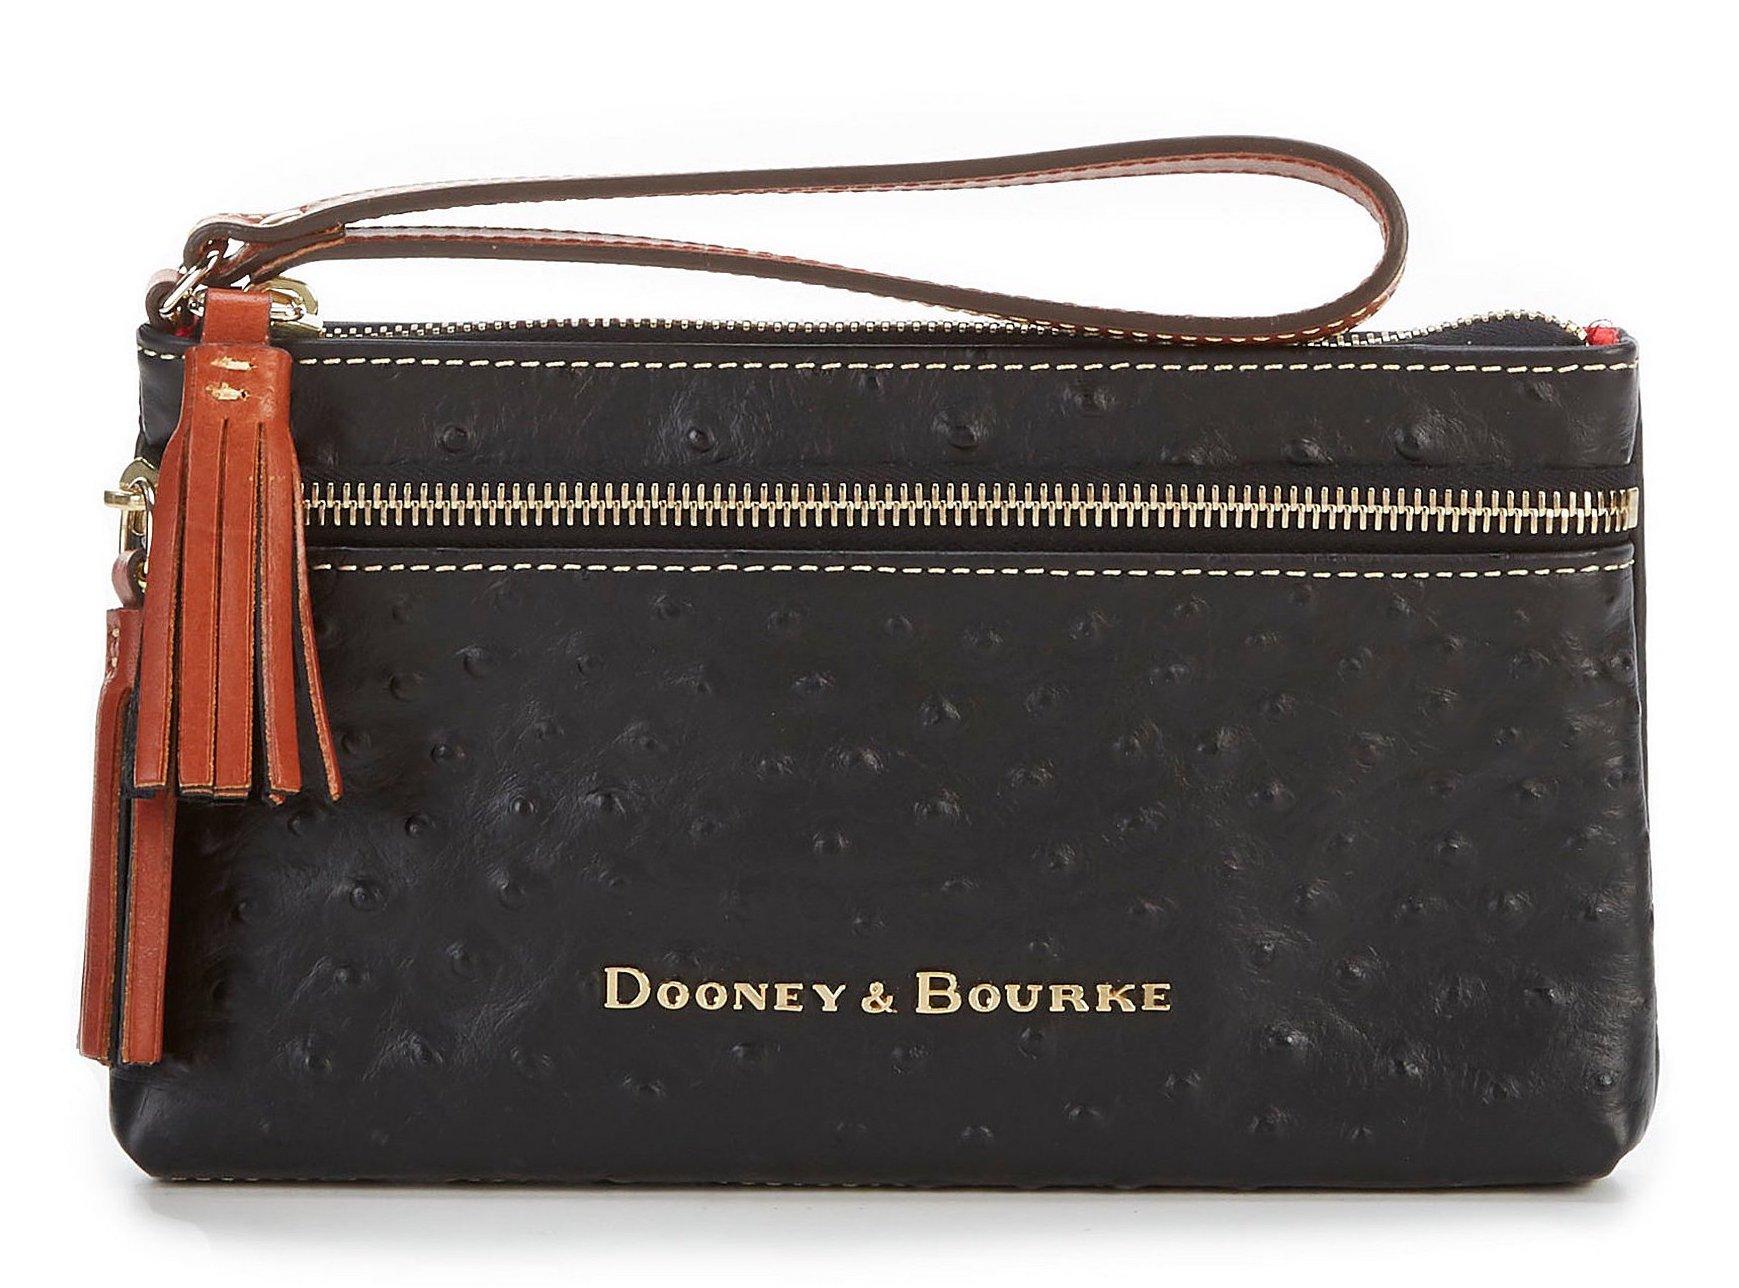 Dooney & Bourke Ostrich Collection Double-Zip Tasseled Wristlet (Black)